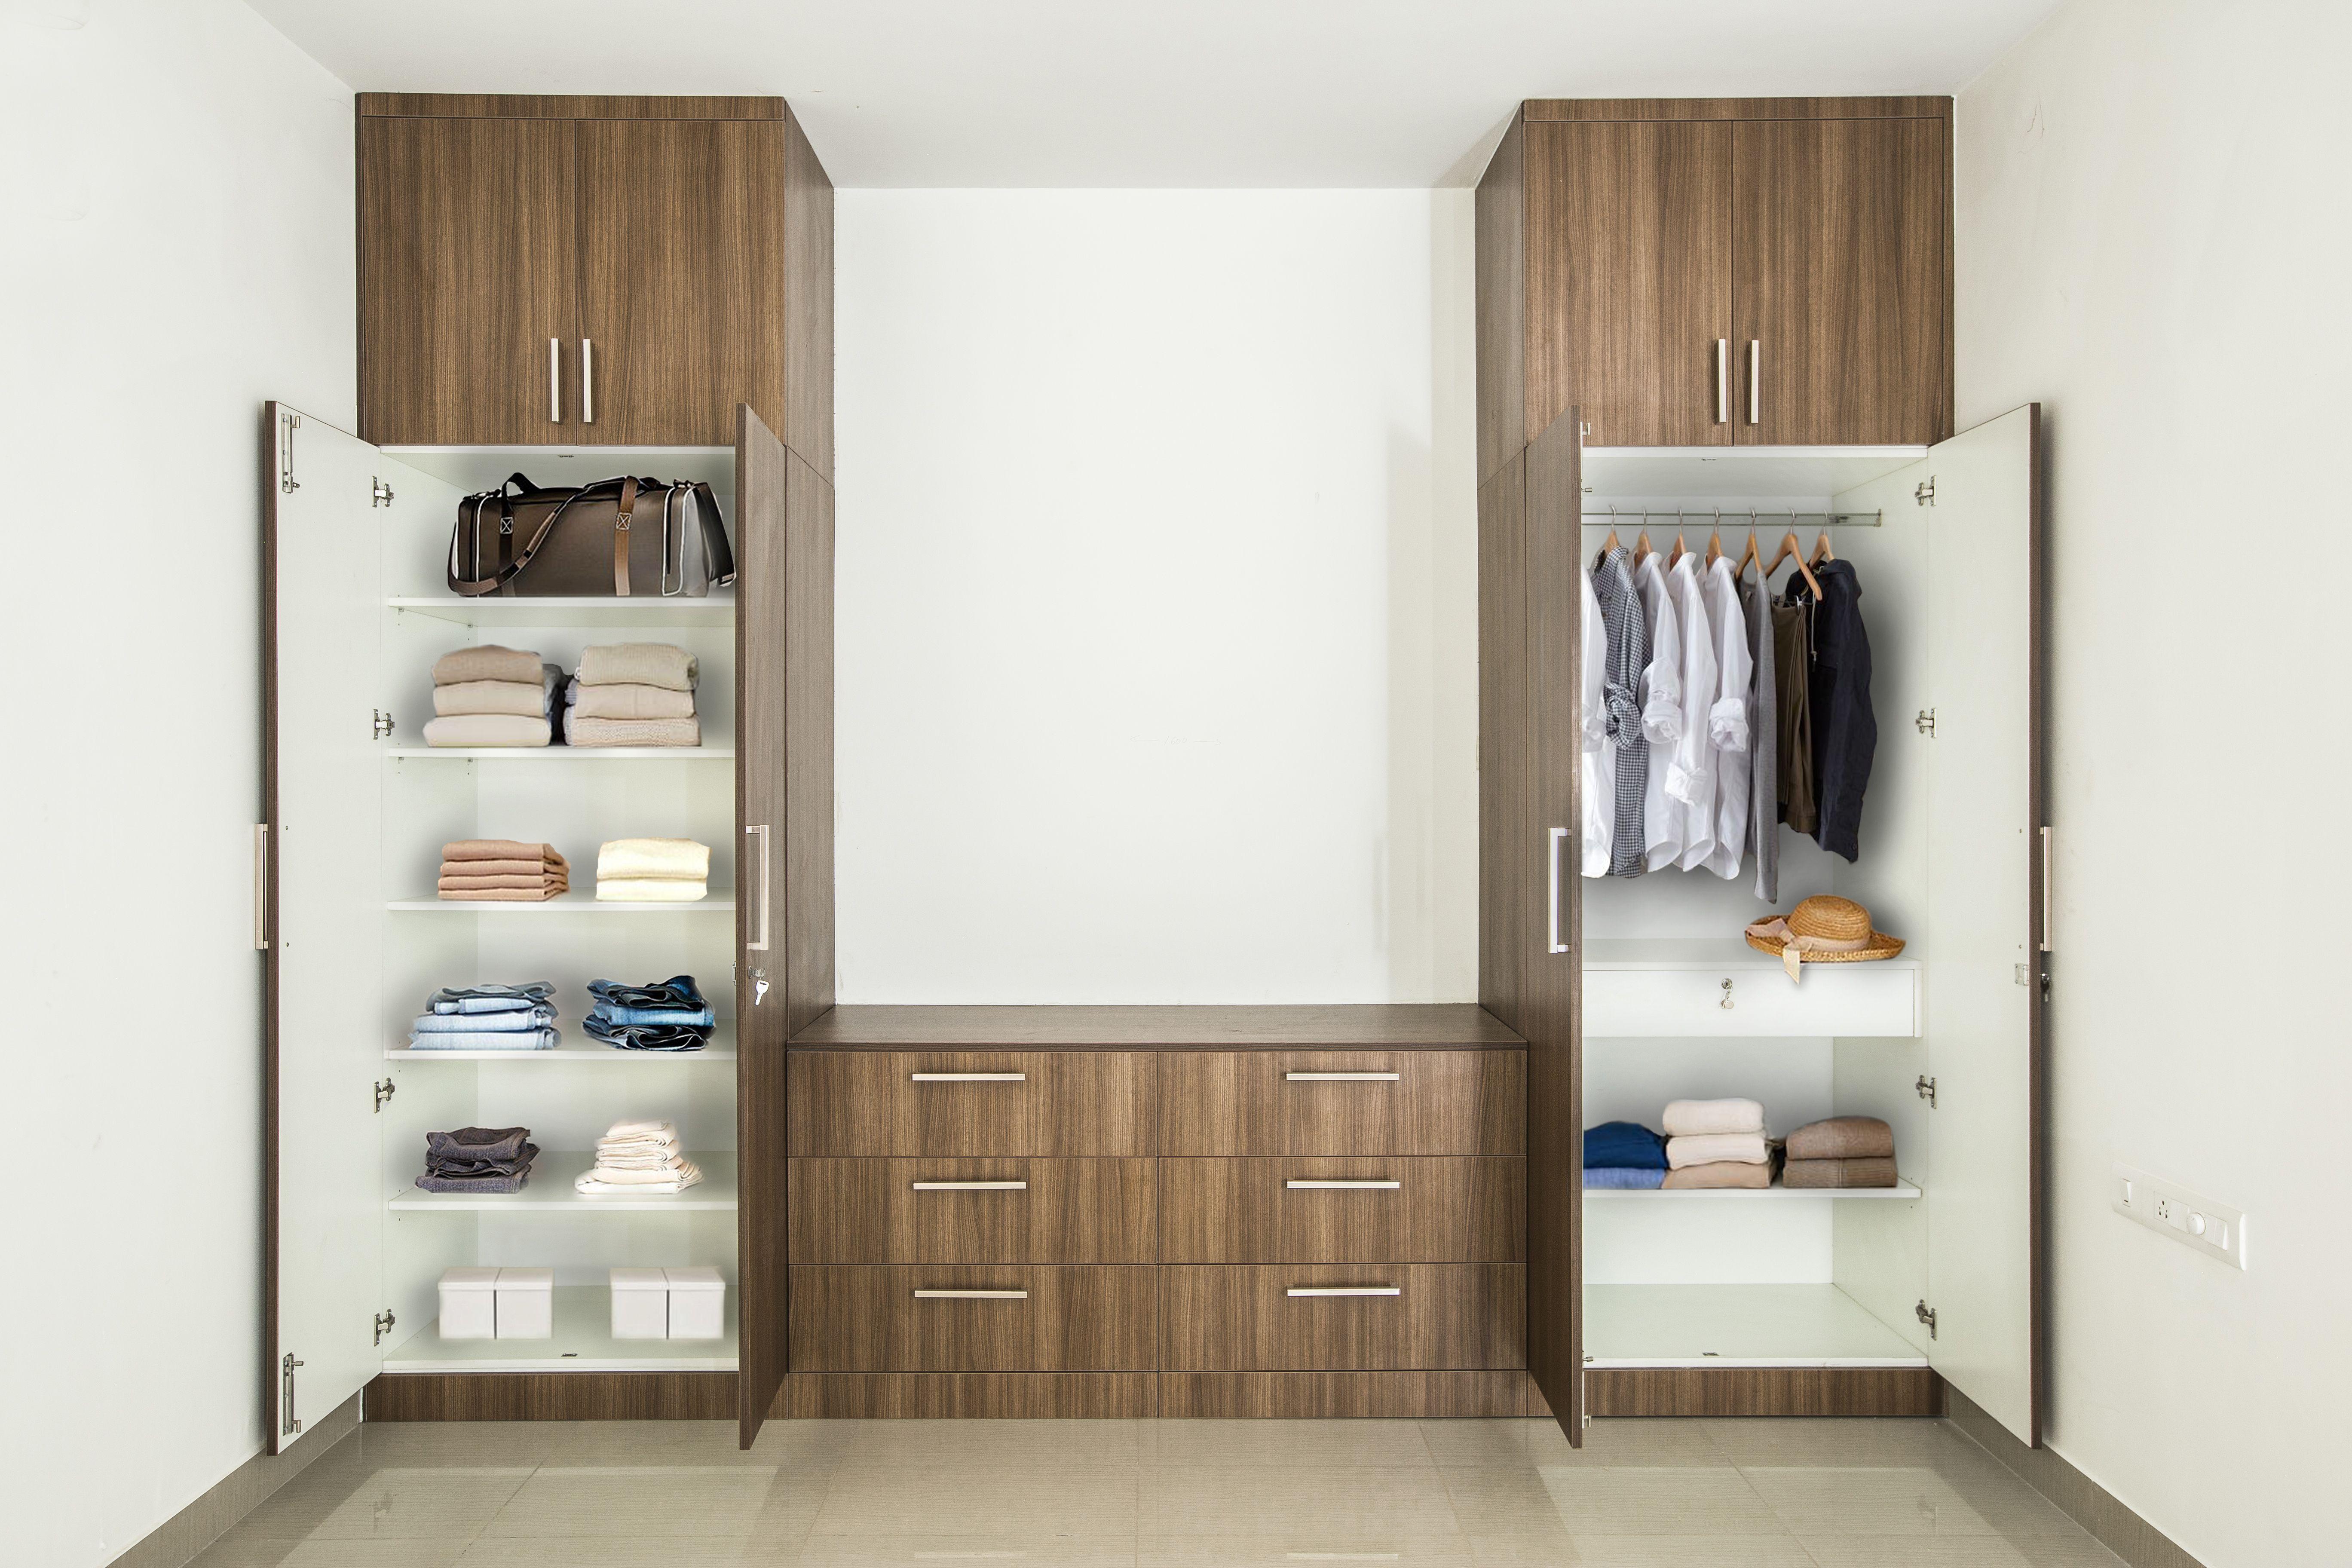 Modular Wardrobe By Homelane Modular Wardrobes Cupboard Design Bedroom Built In Wardrobe